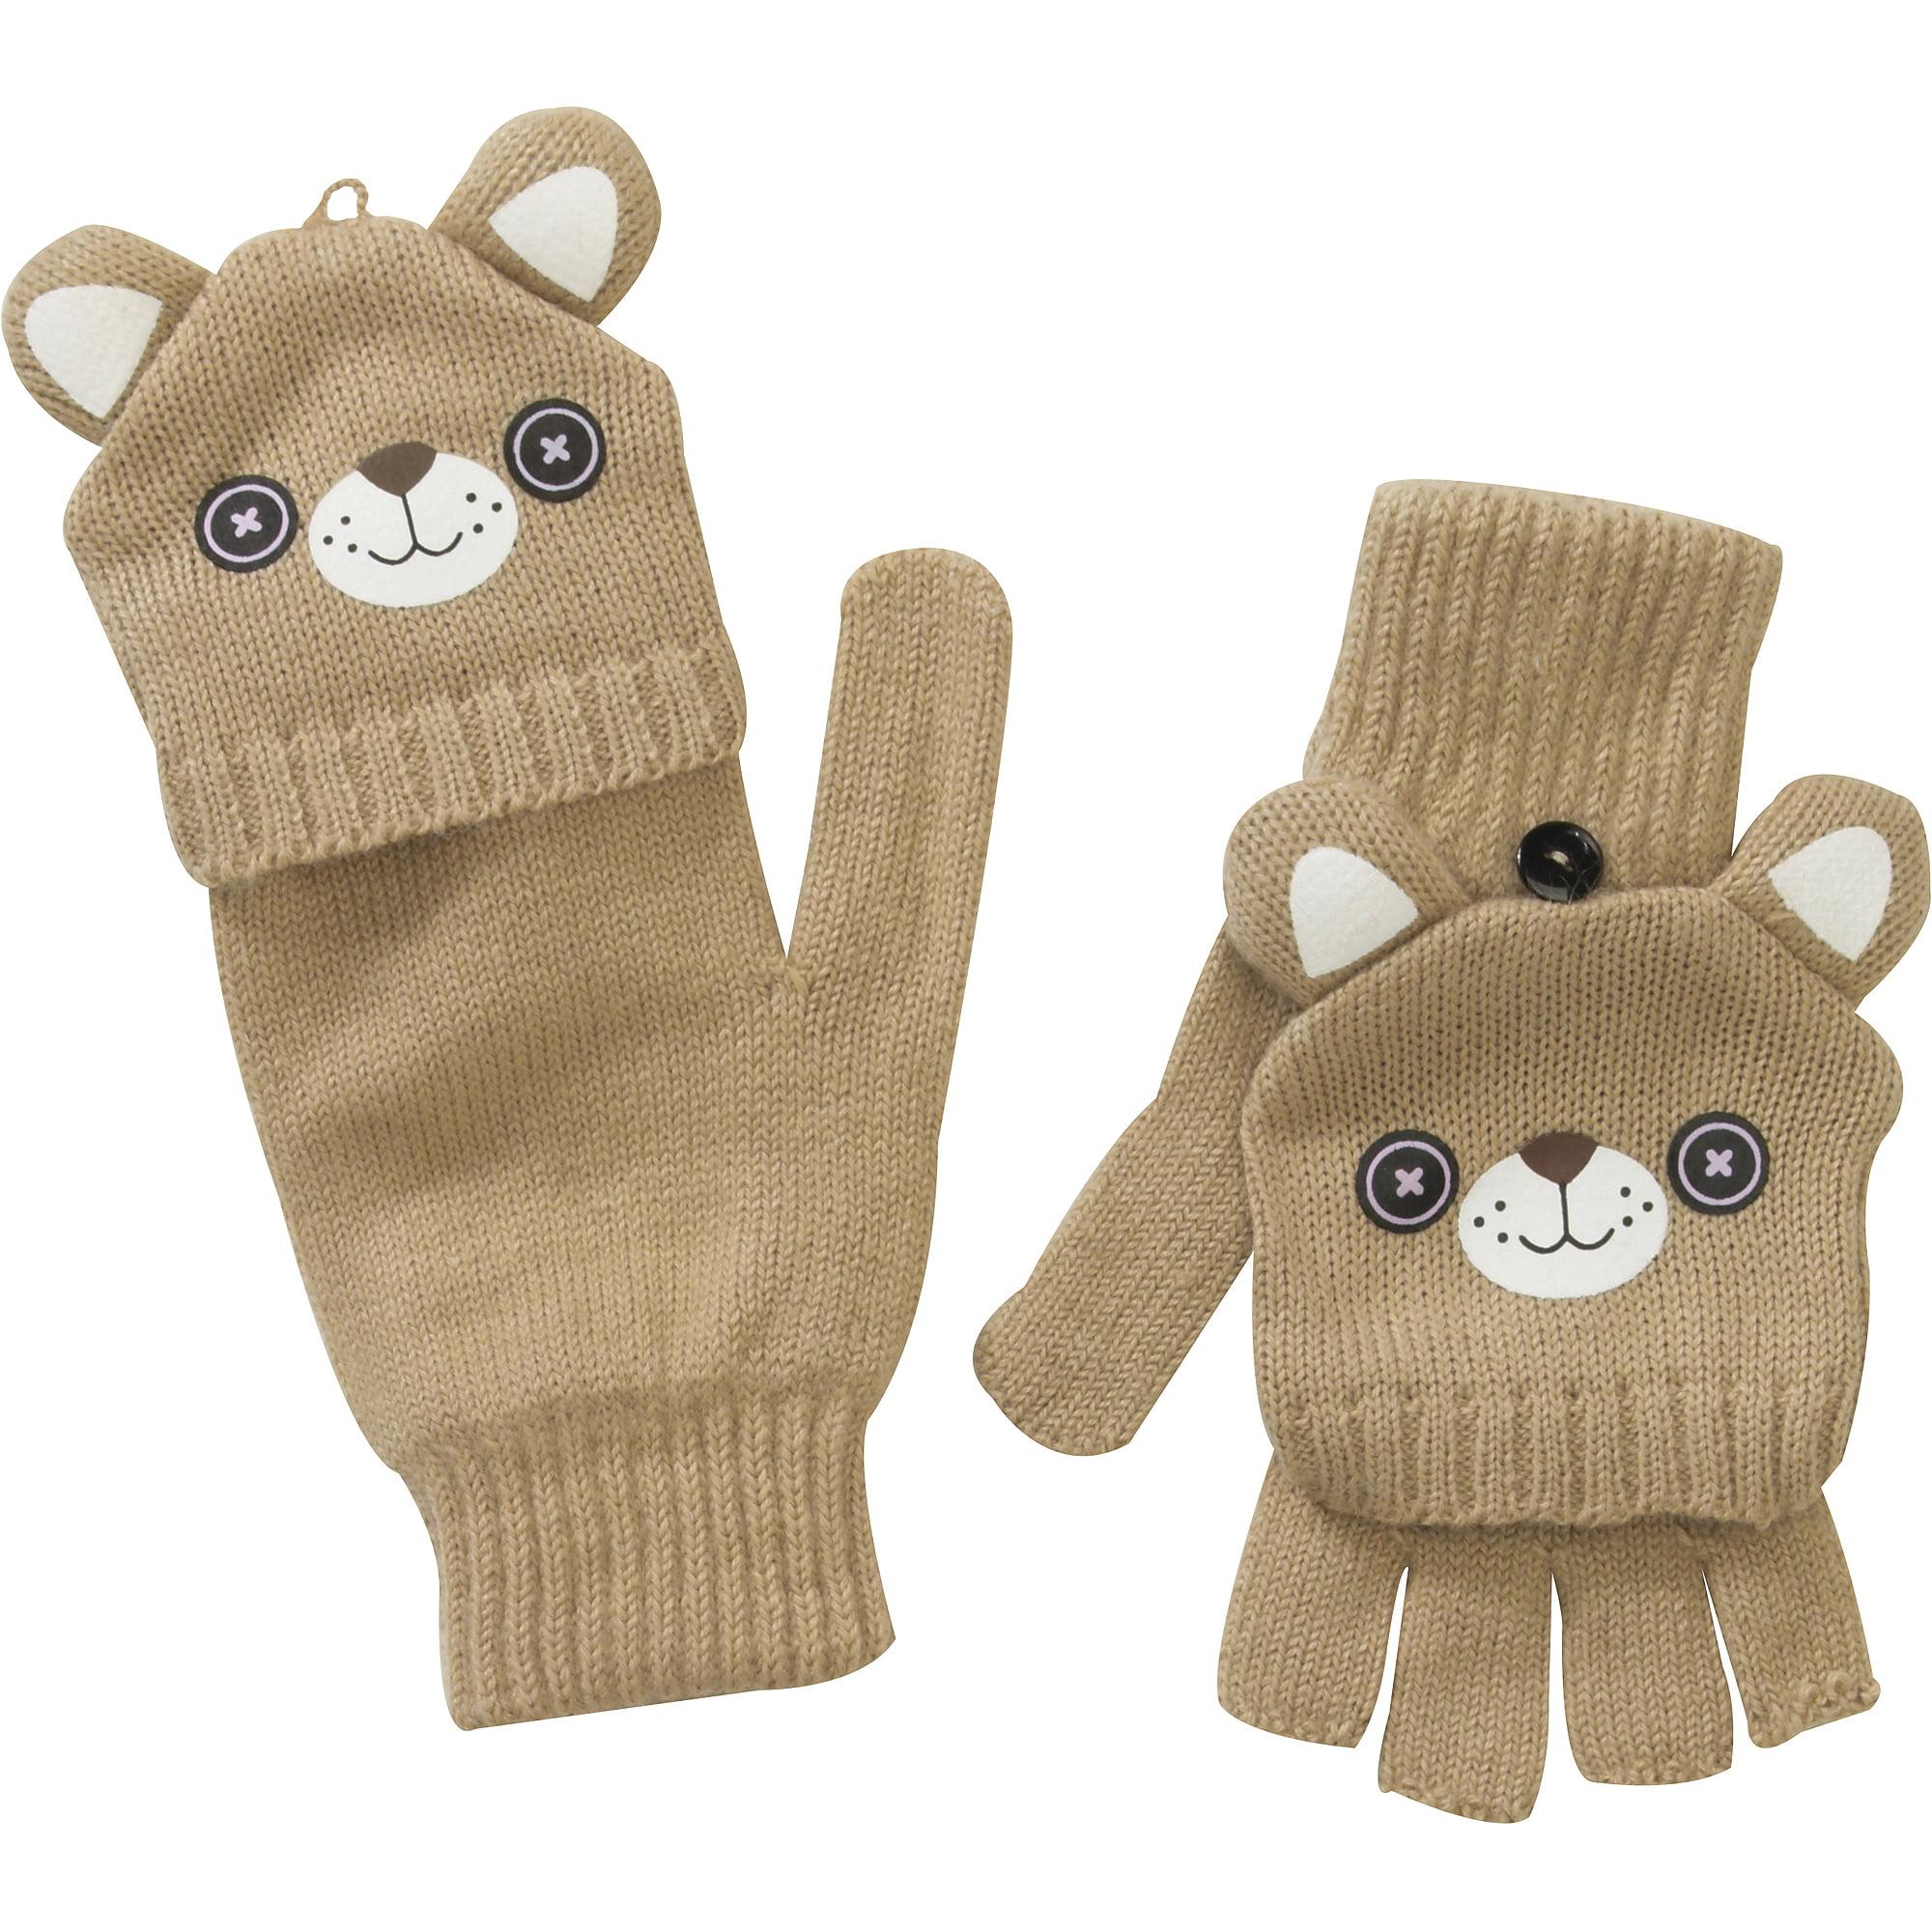 Adult Cat Flip Top Gloves